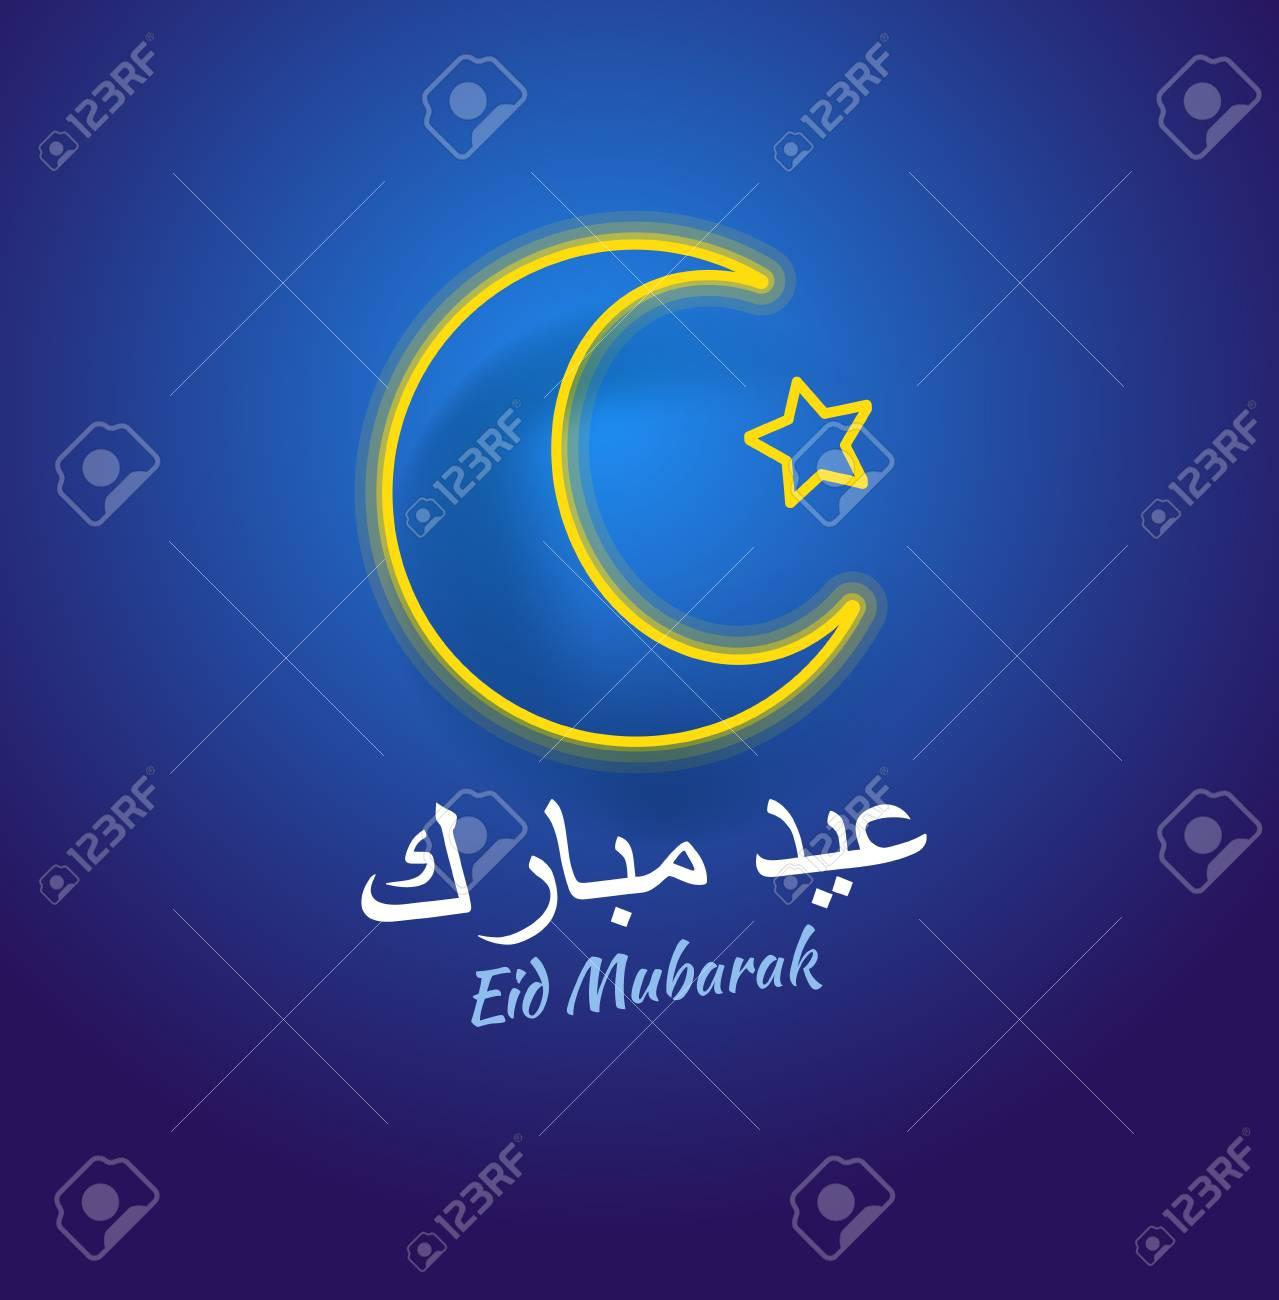 Eid mubarak greeting card vector illustration royalty free eid mubarak greeting card vector illustration stock vector 103581798 m4hsunfo